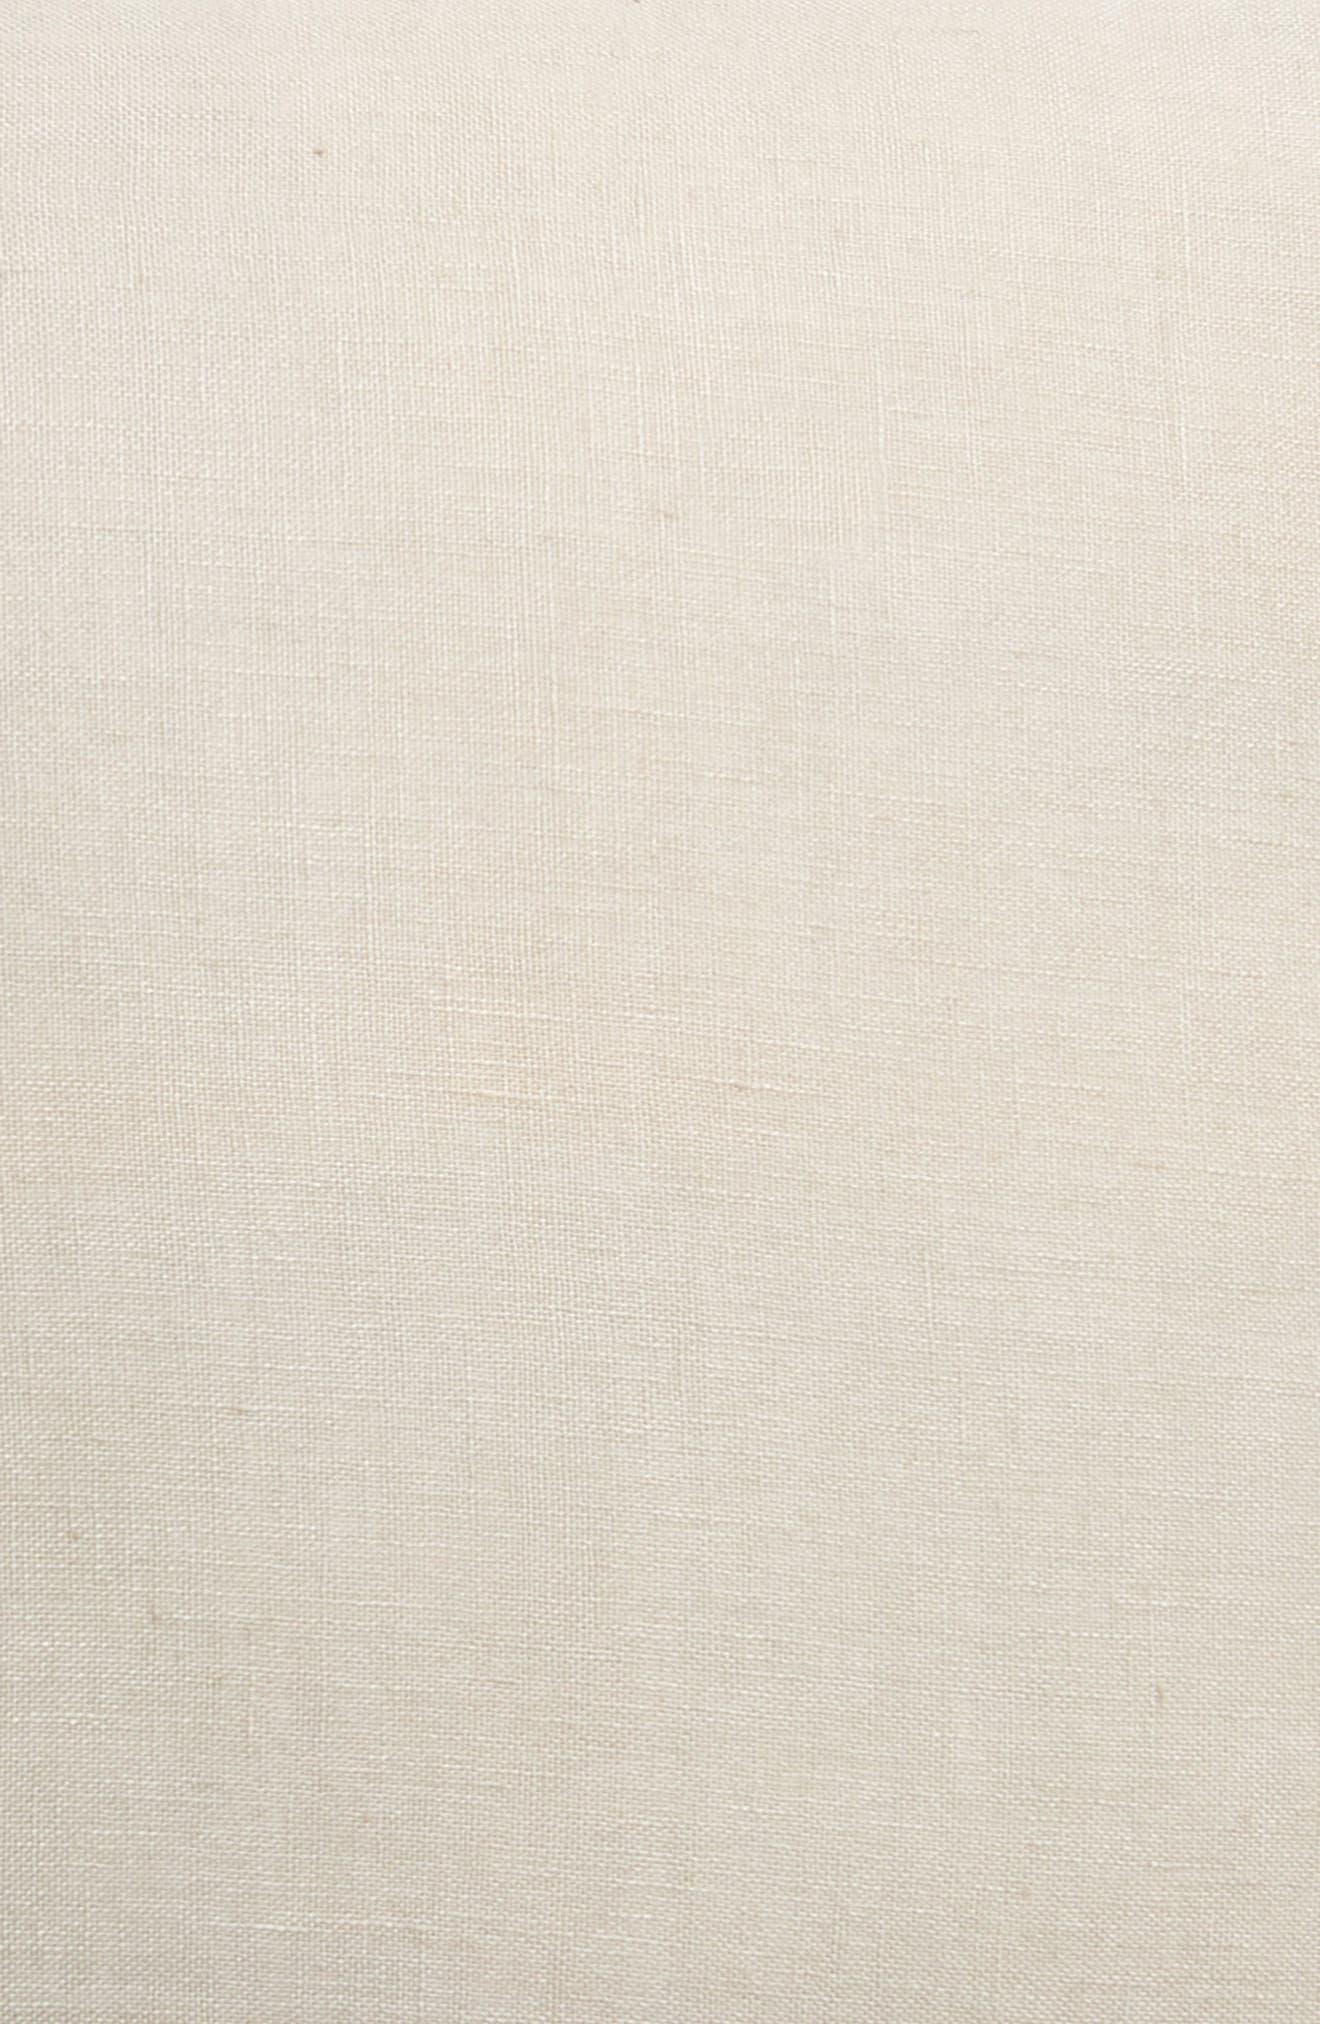 Linen Accent Pillow,                             Alternate thumbnail 3, color,                             GREY OWL